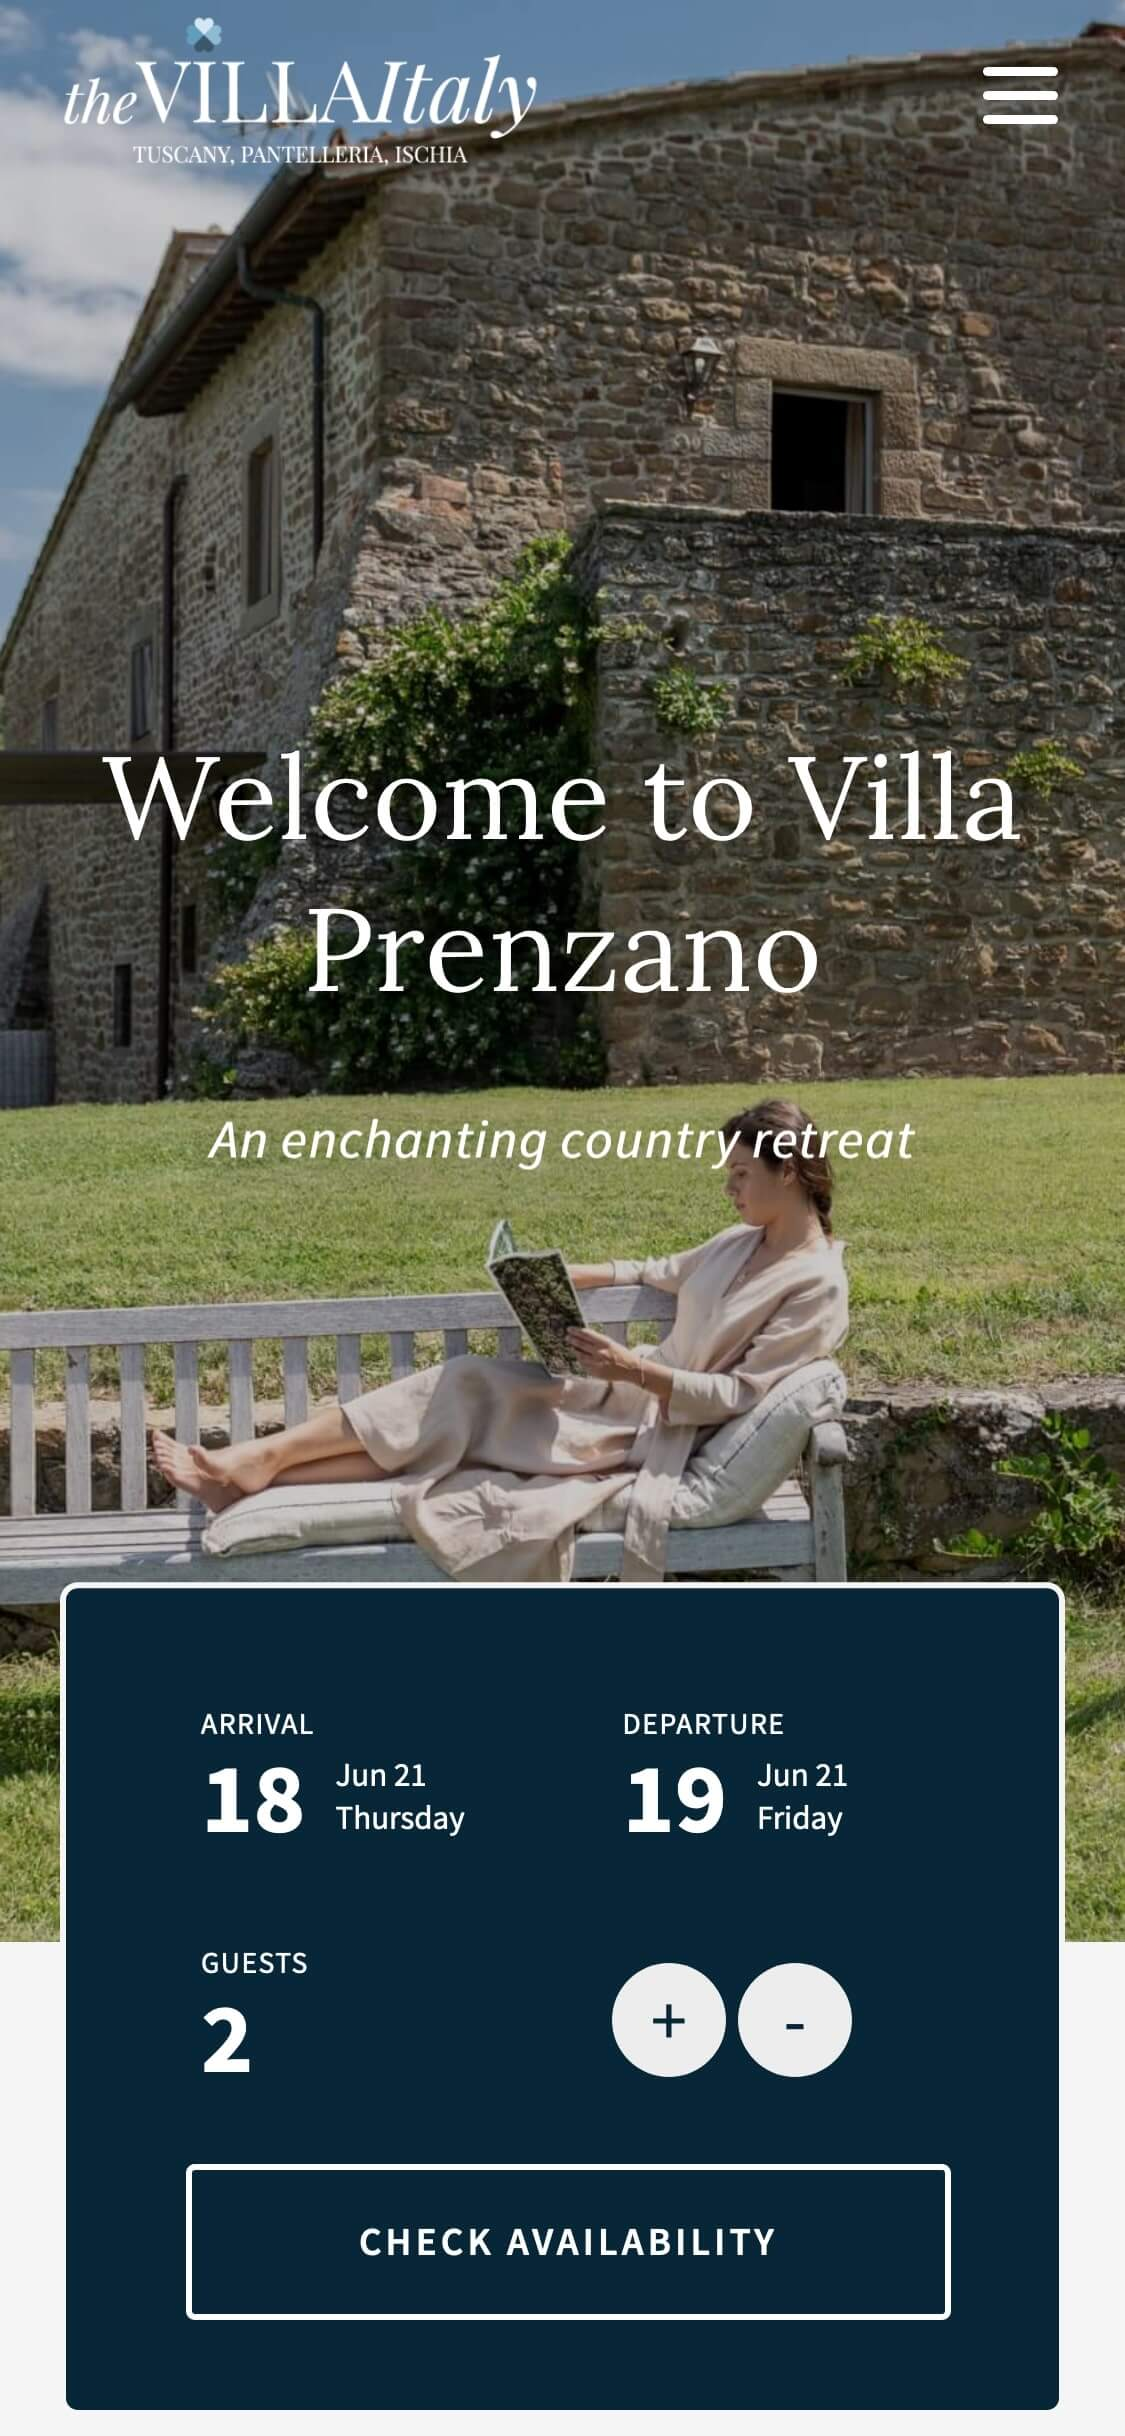 WordPress Website Design & Development - Mobile Mockup - The Villa Italy